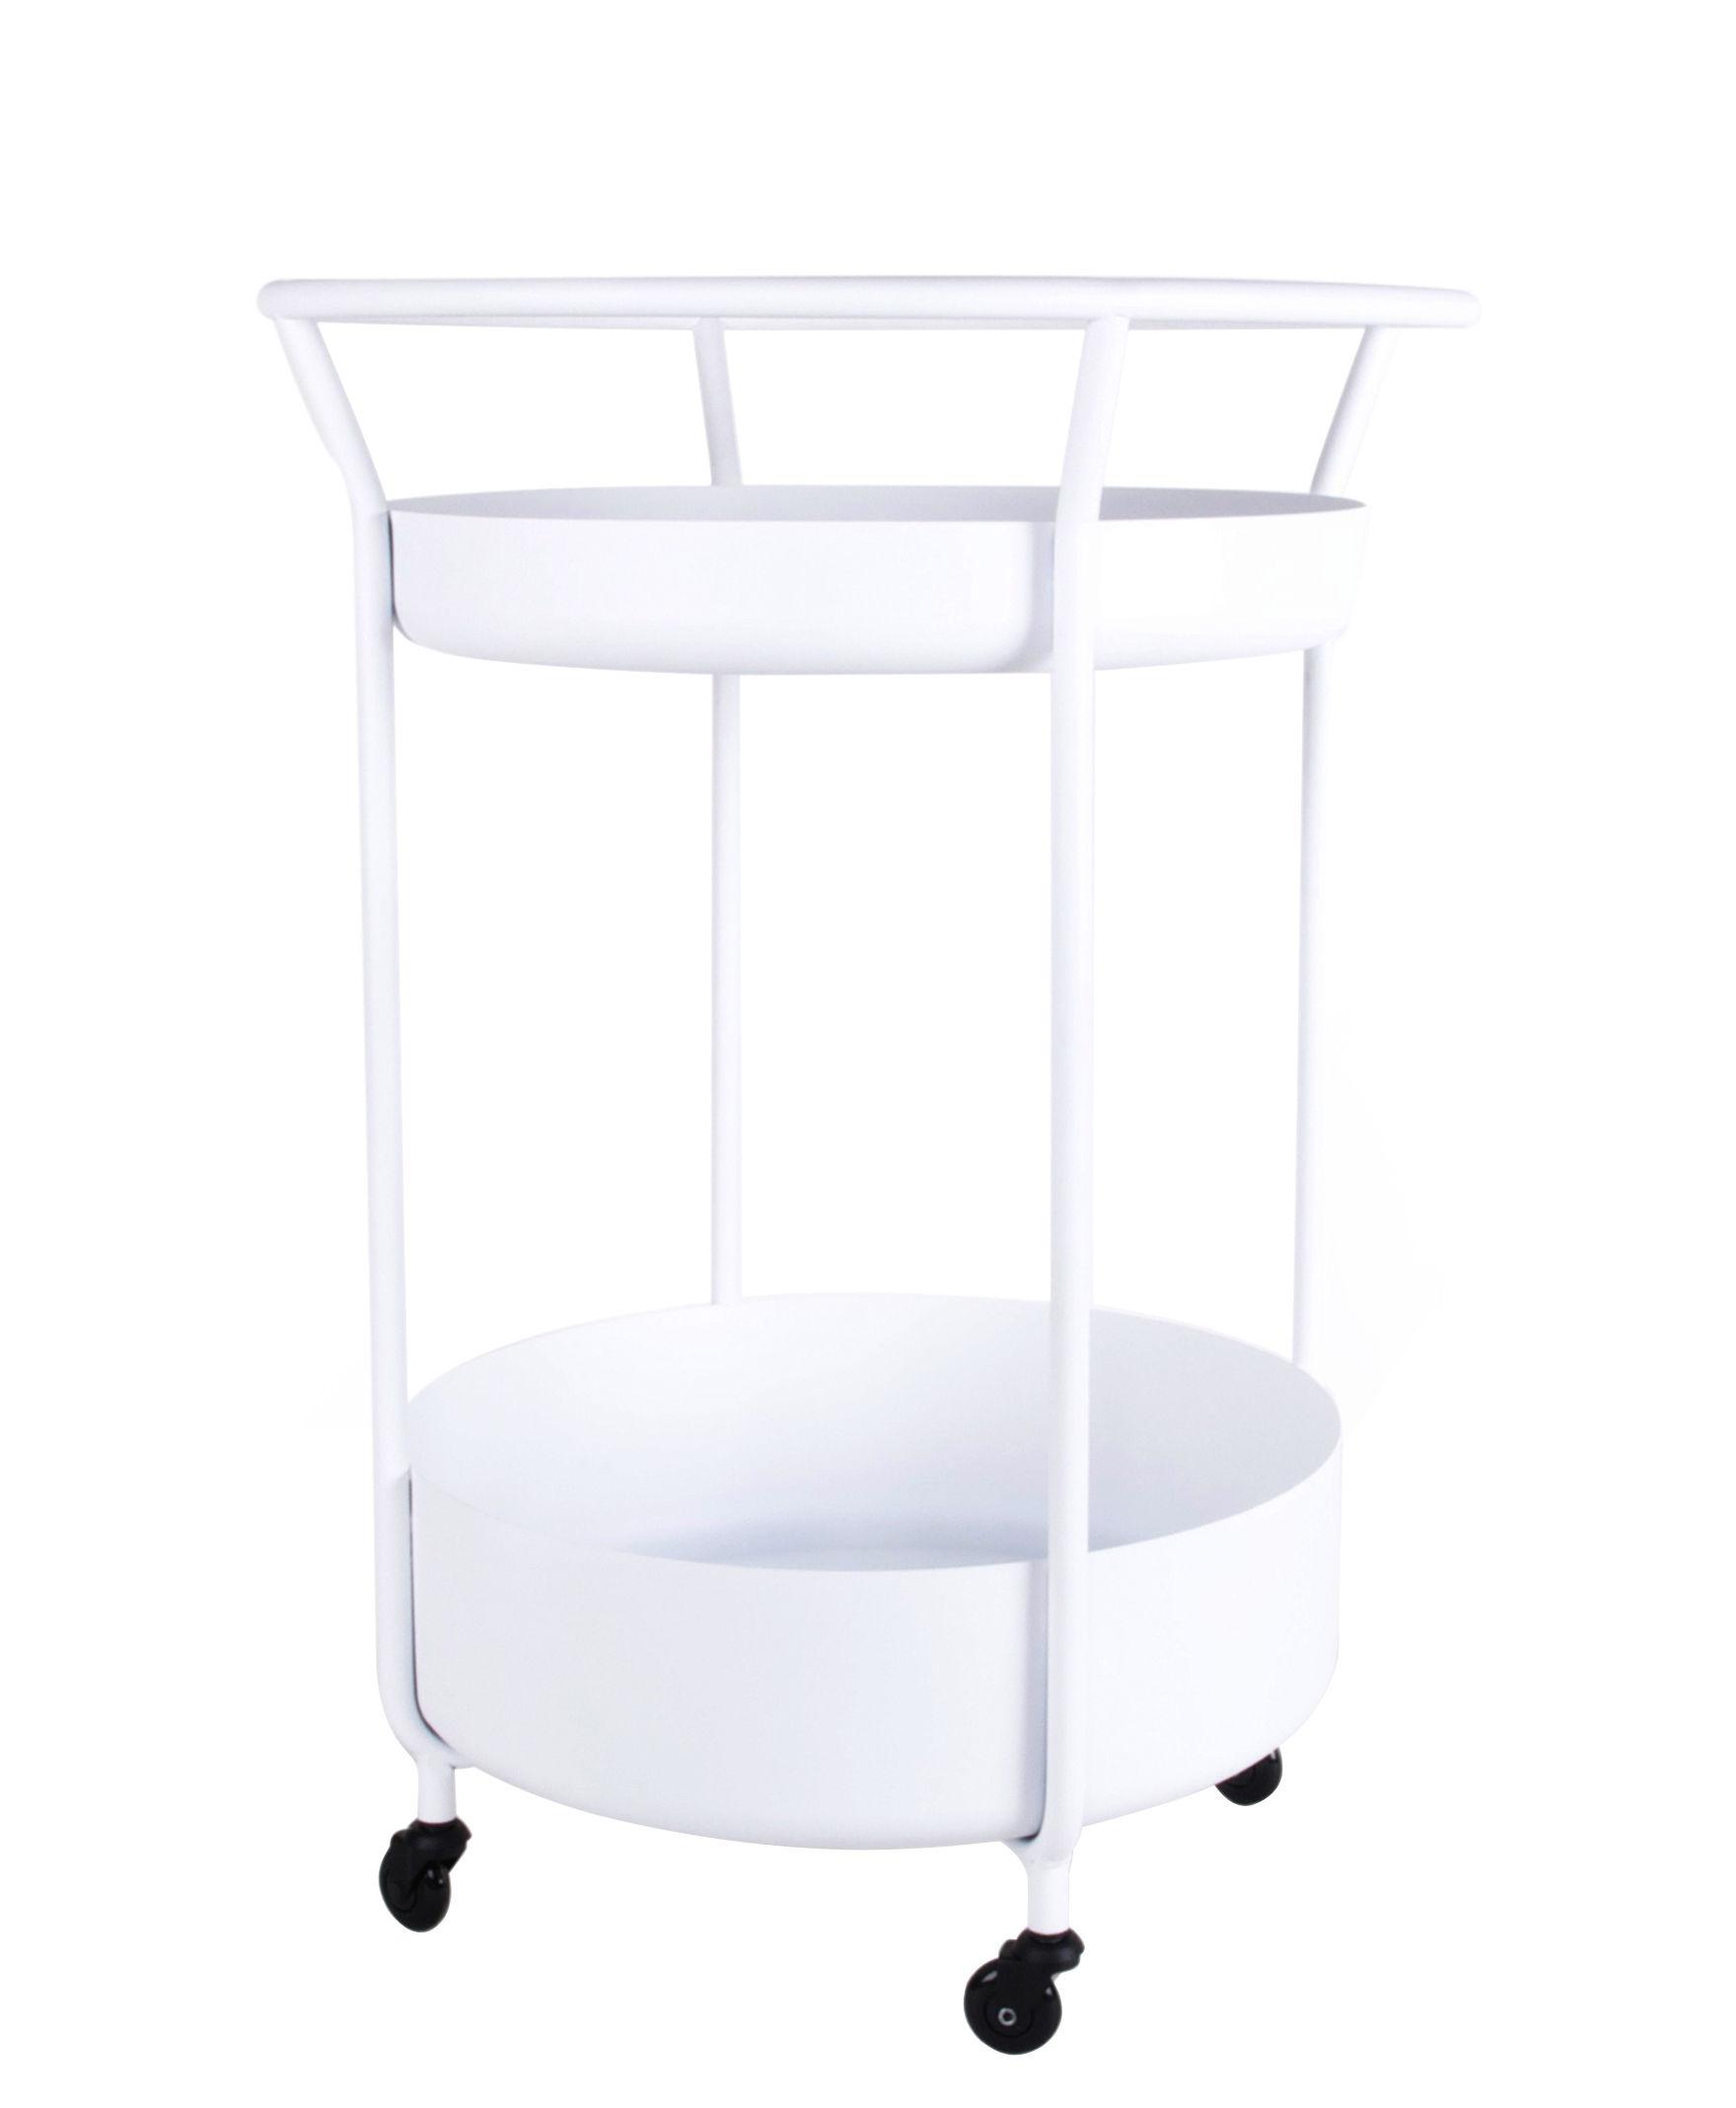 Furniture - Miscellaneous furniture - Corona Dresser - Steel by XL Boom - White - Epoxy lacquered steel